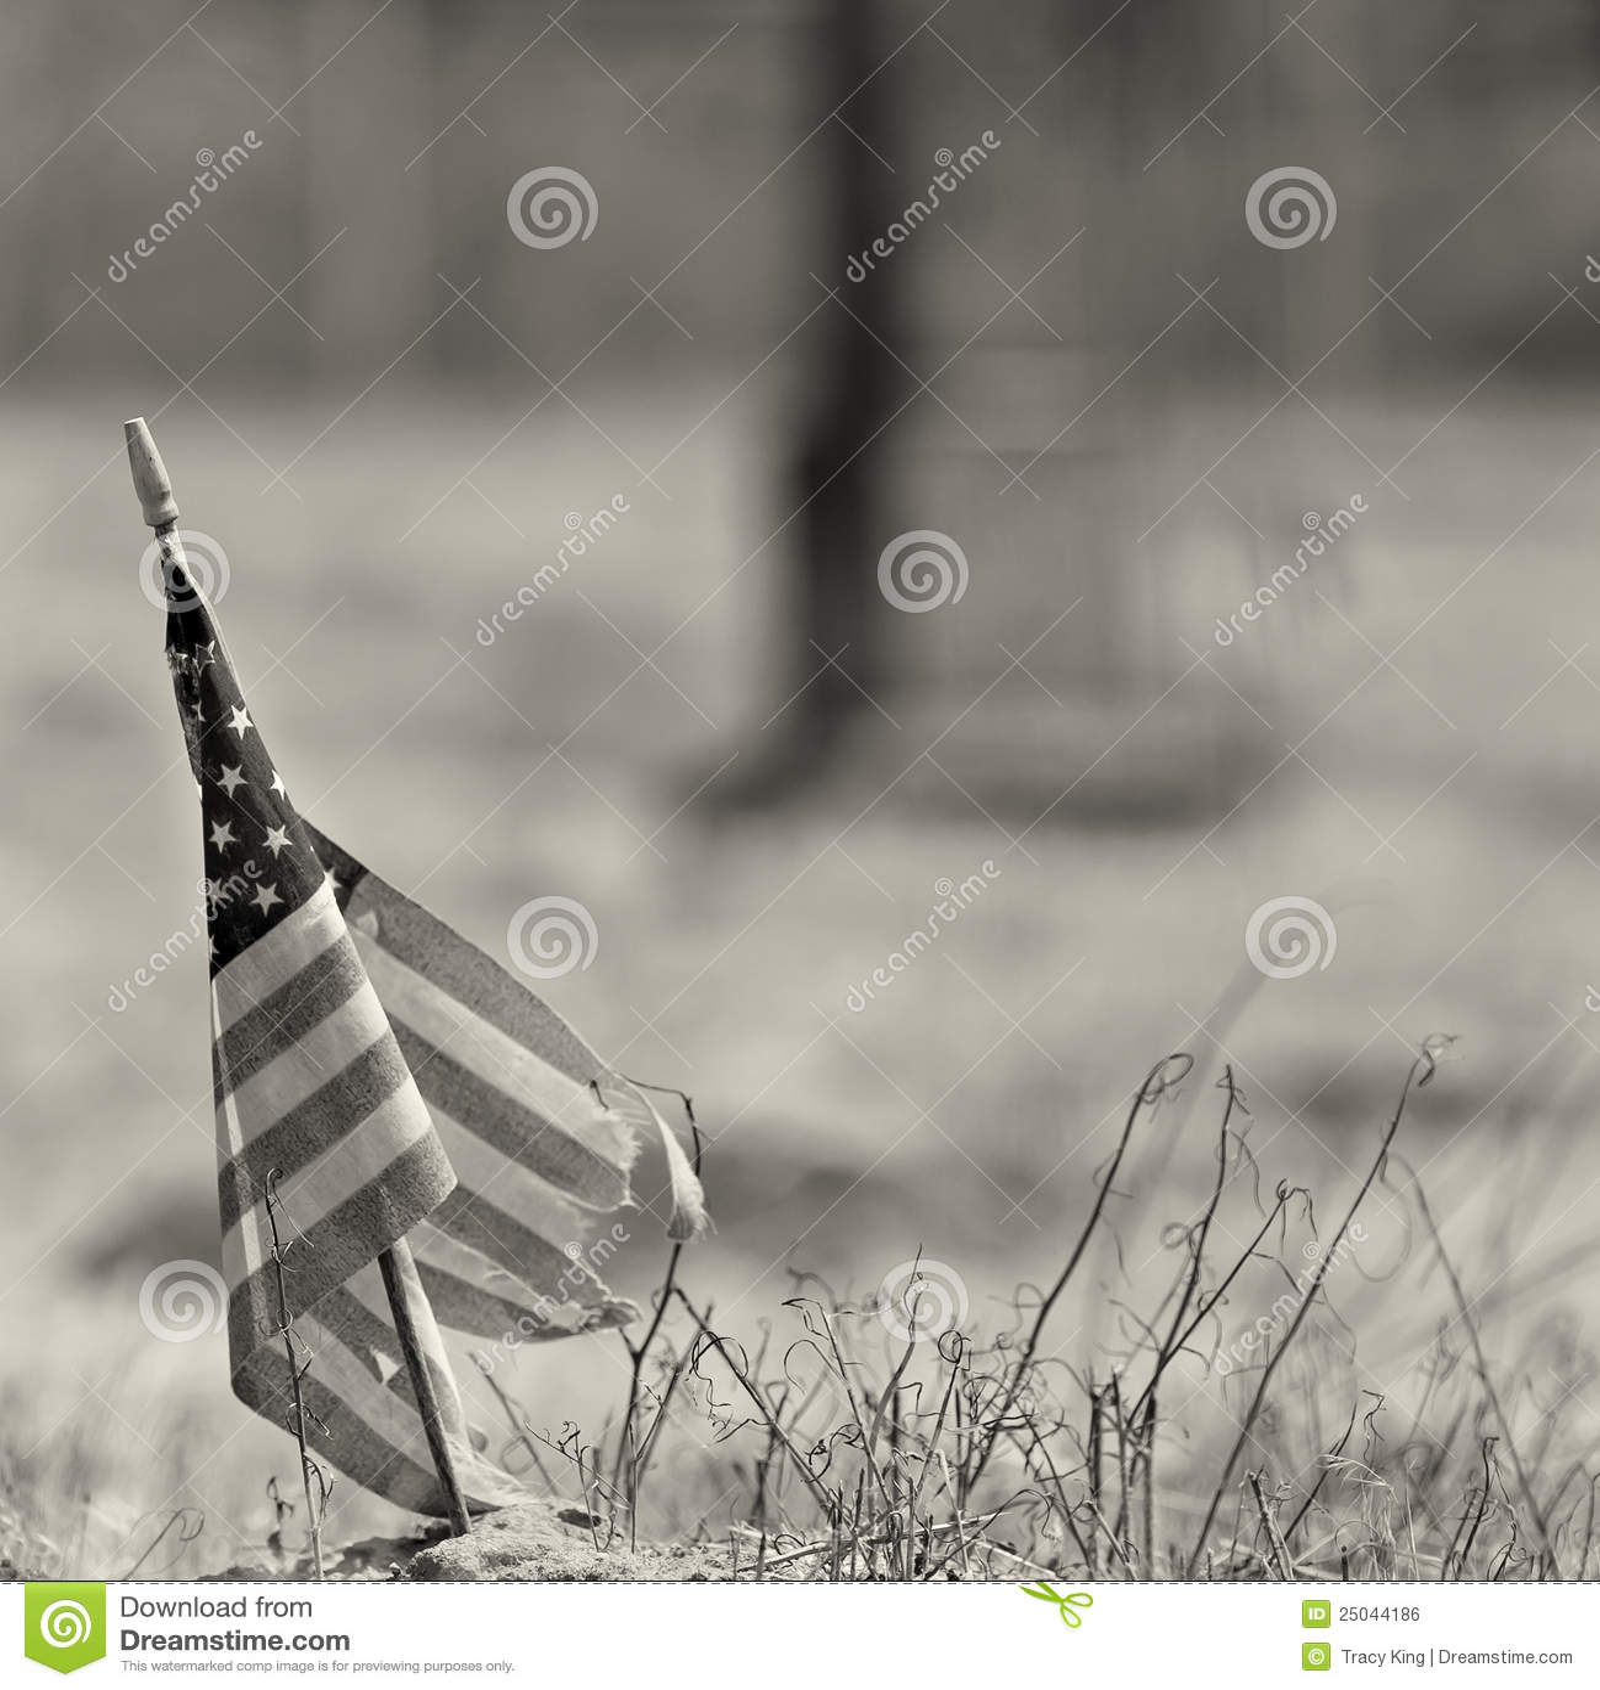 Amerikansk slitage fotowhite för svart flagga ut